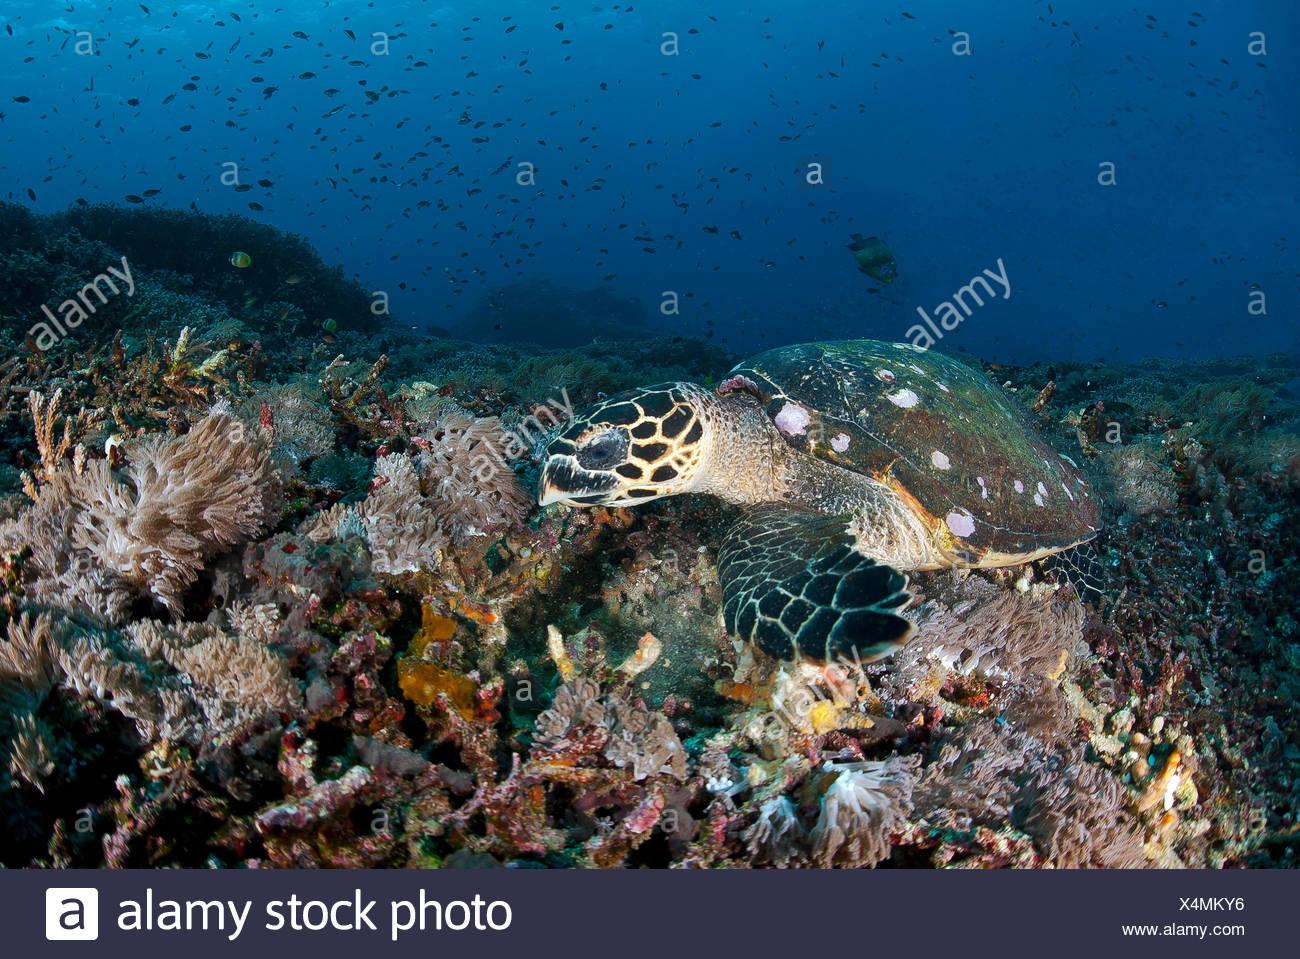 Tortuga carey (Eretmochelys imbricata),en el forraje a lo largo de arrecifes de coral,Nusa Penida, Bali, Nusa Lembongan,Indonesia Imagen De Stock